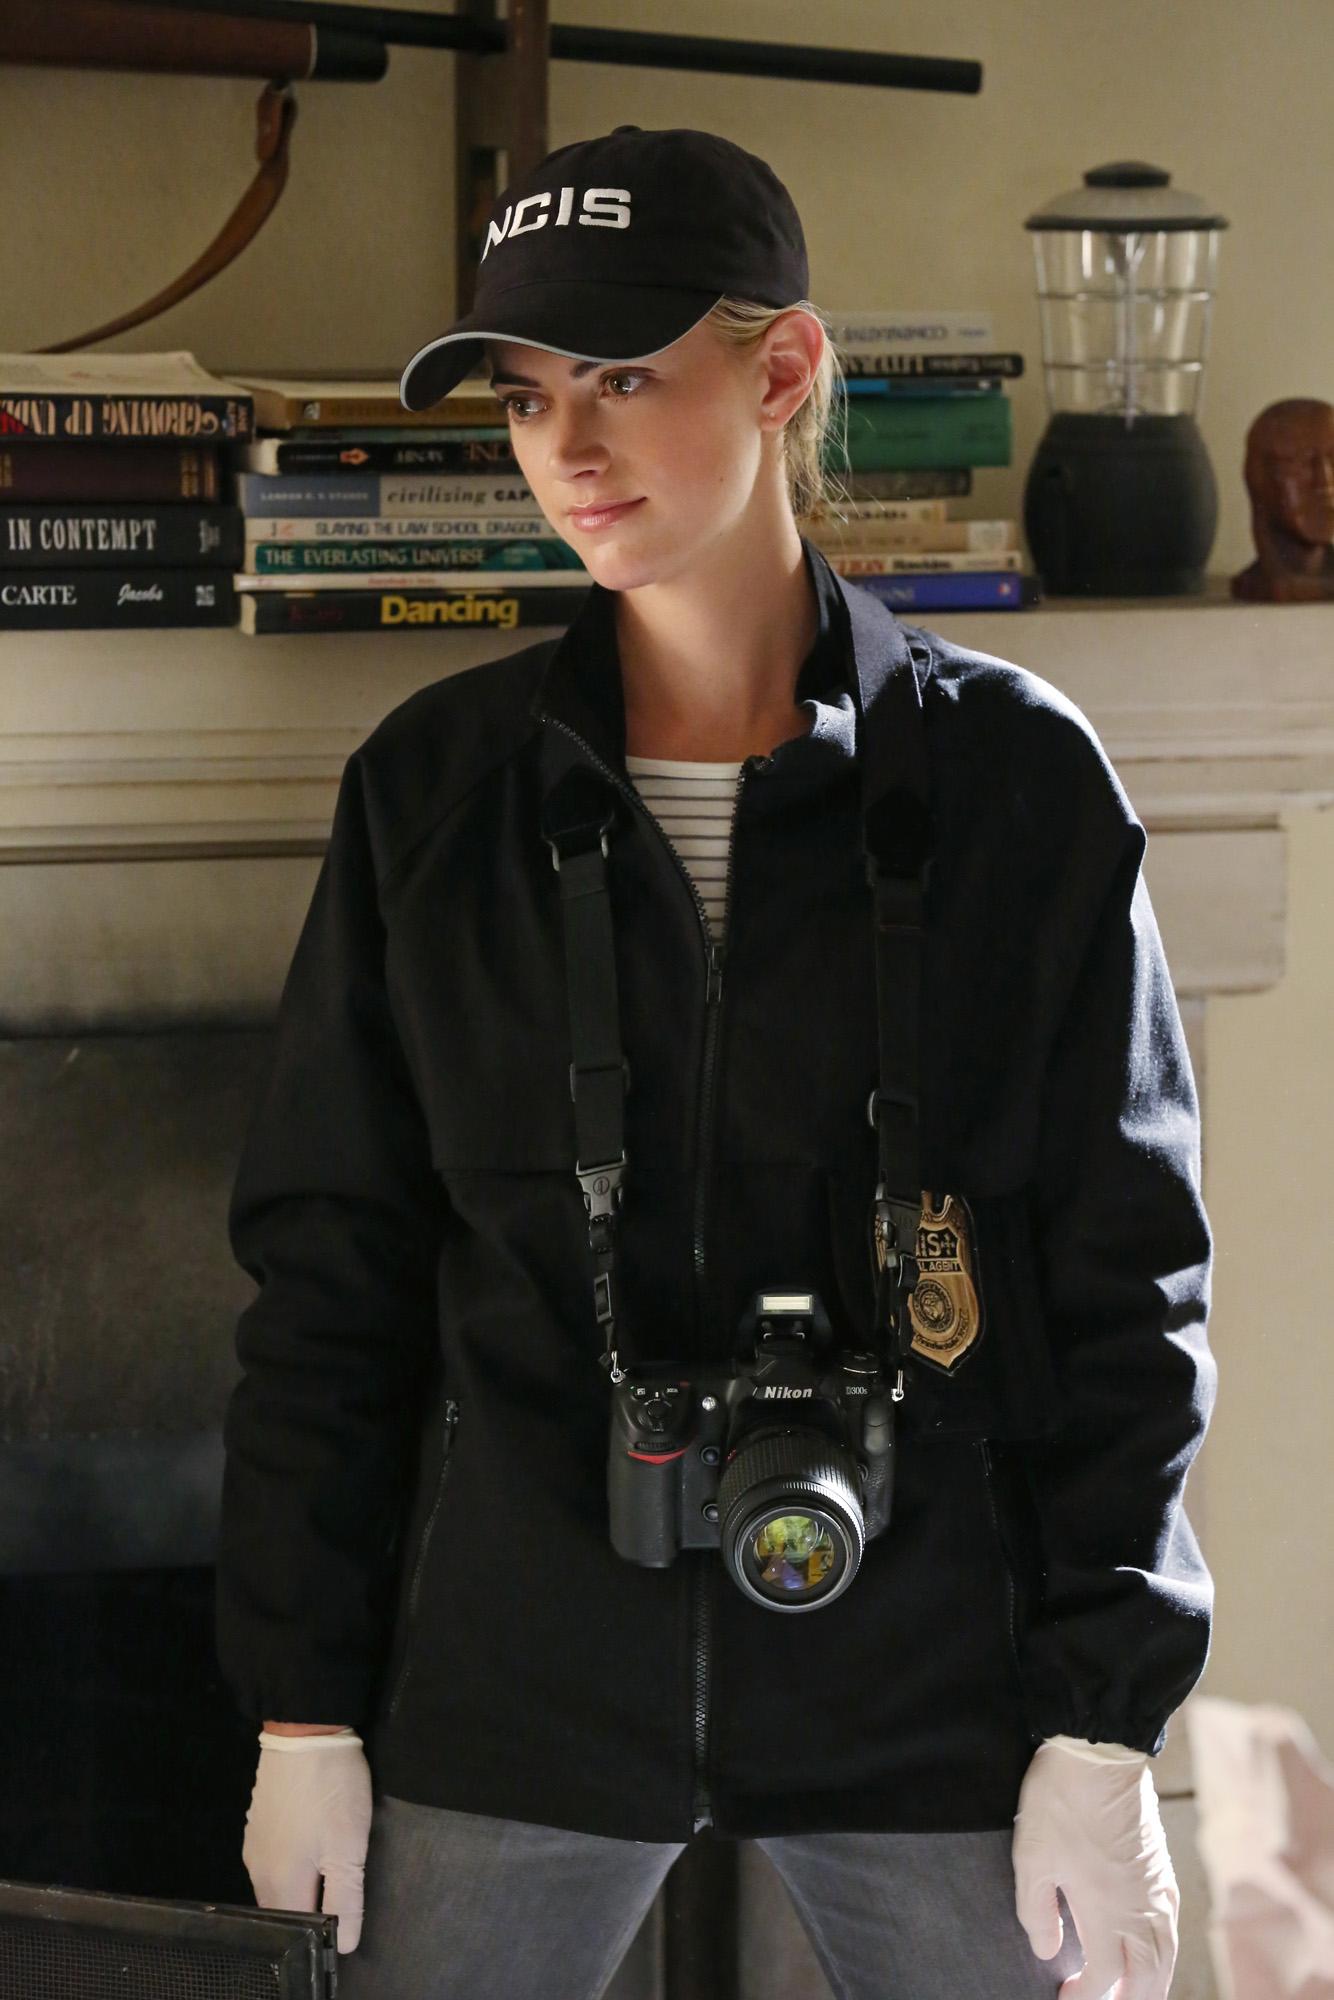 New Field Agent